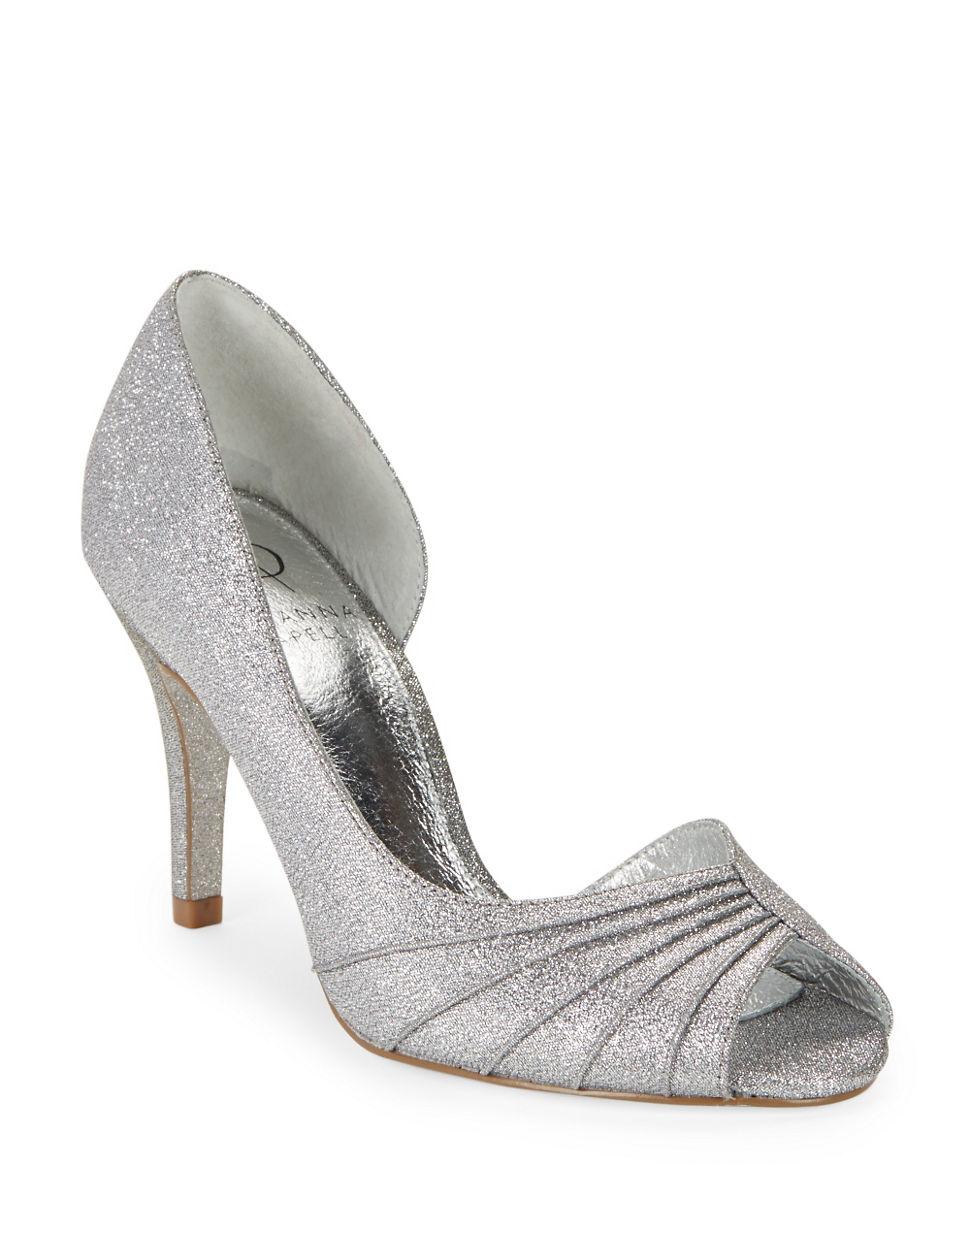 Steven Alan Shoes Women